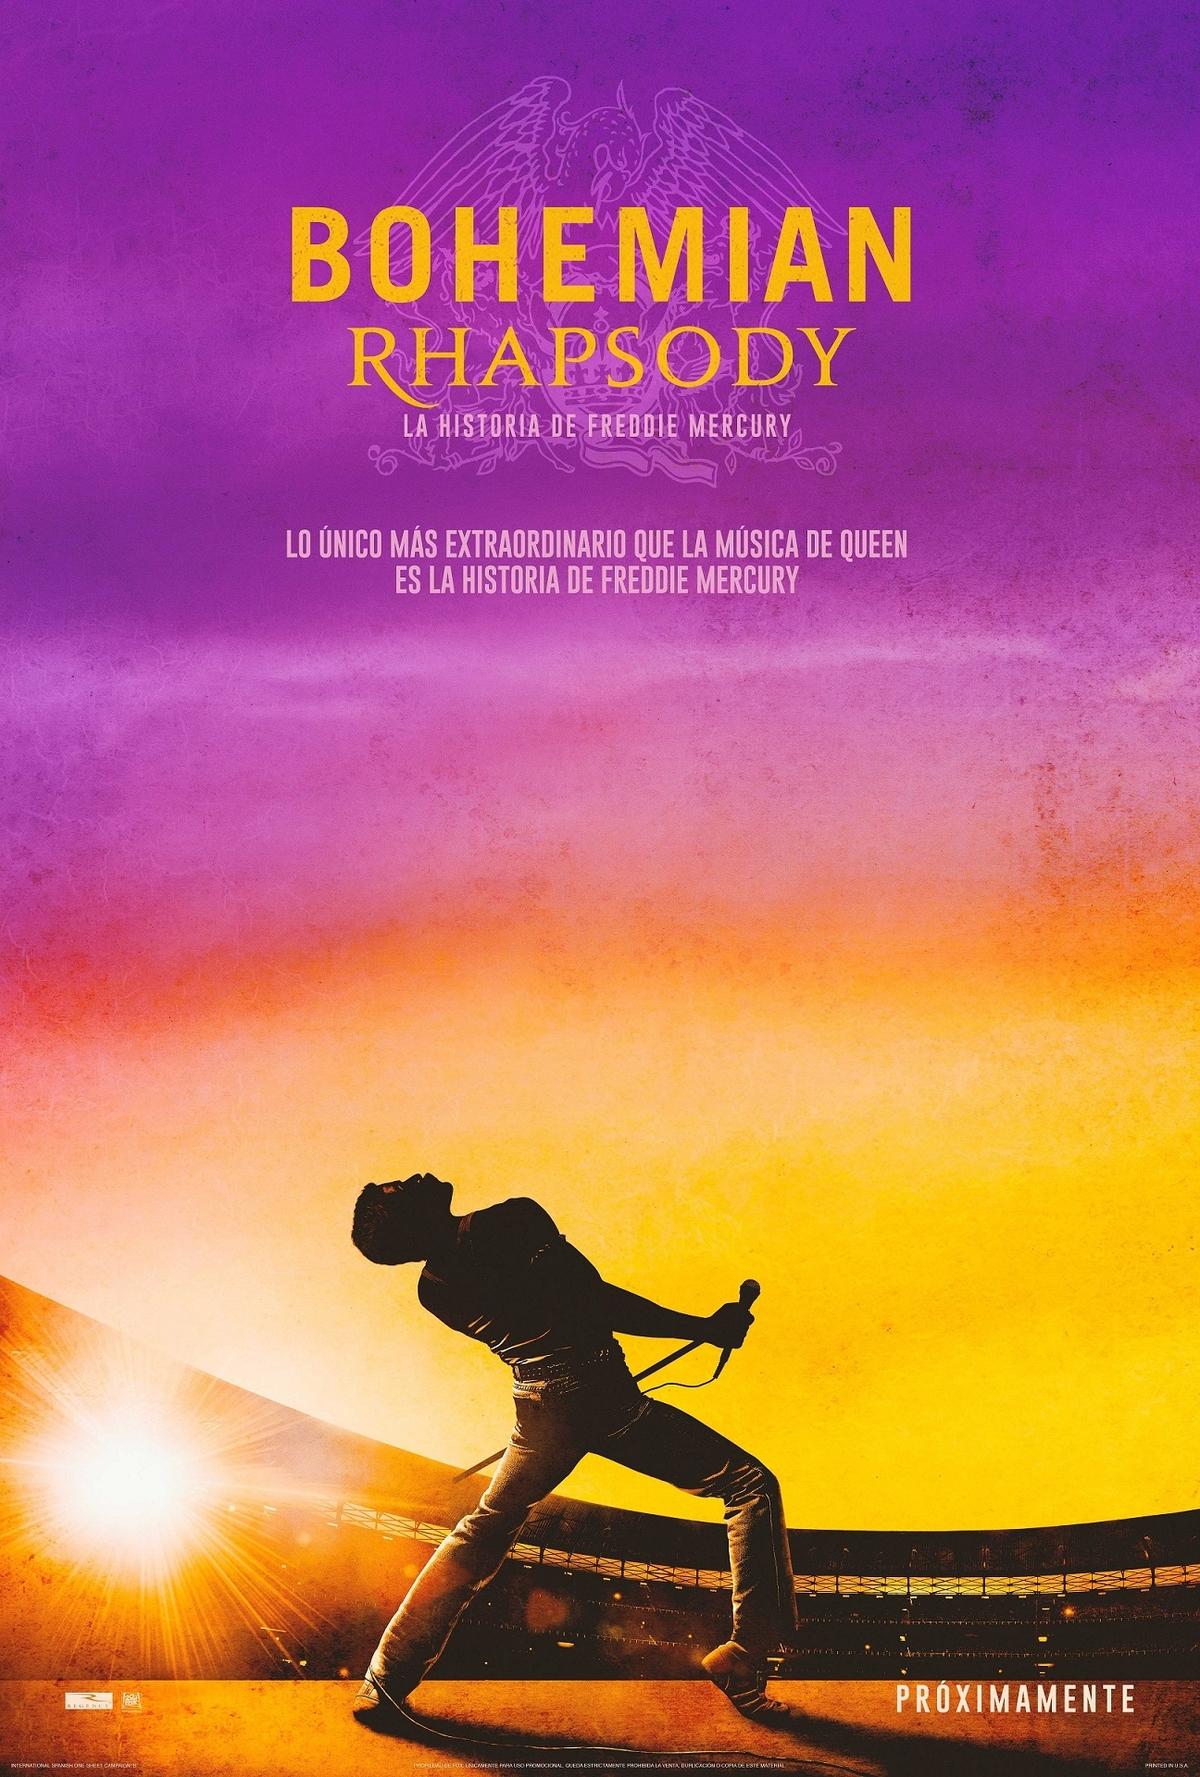 Bohemian_Rhapsody_Poster_Teaser_2